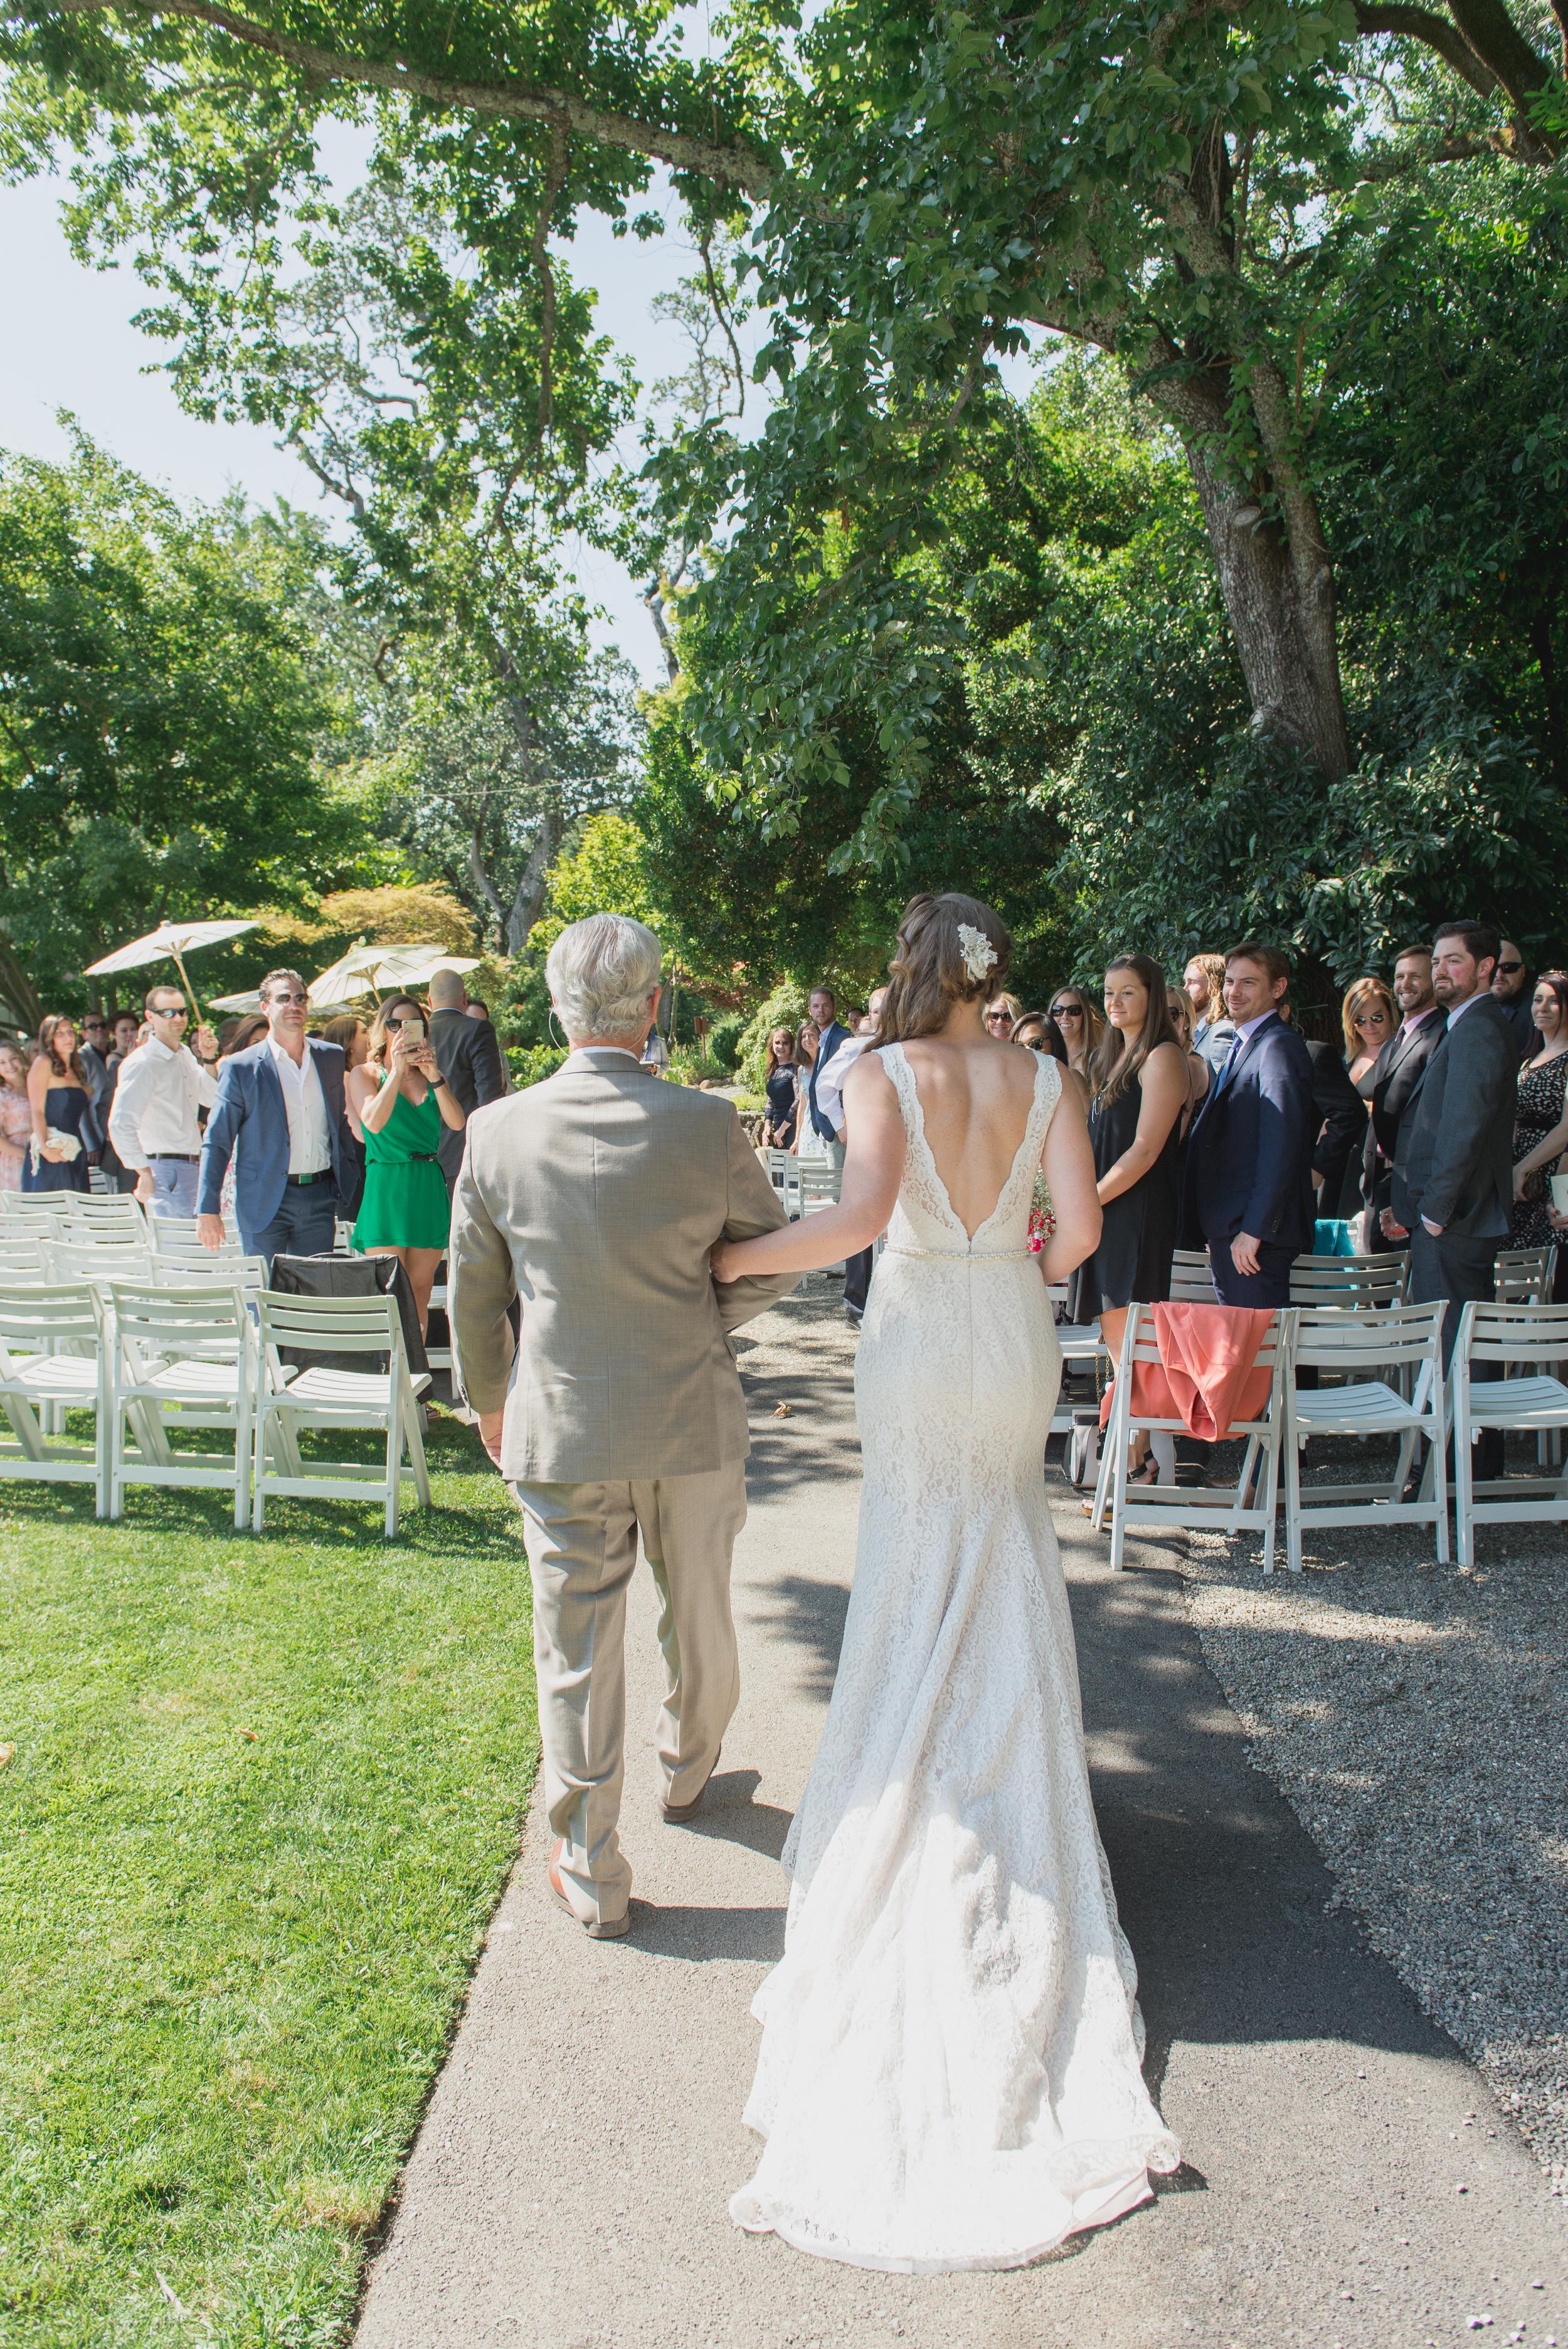 08-down-to-earth-marin-art-garden-center-wedding-vivianchen.jpg